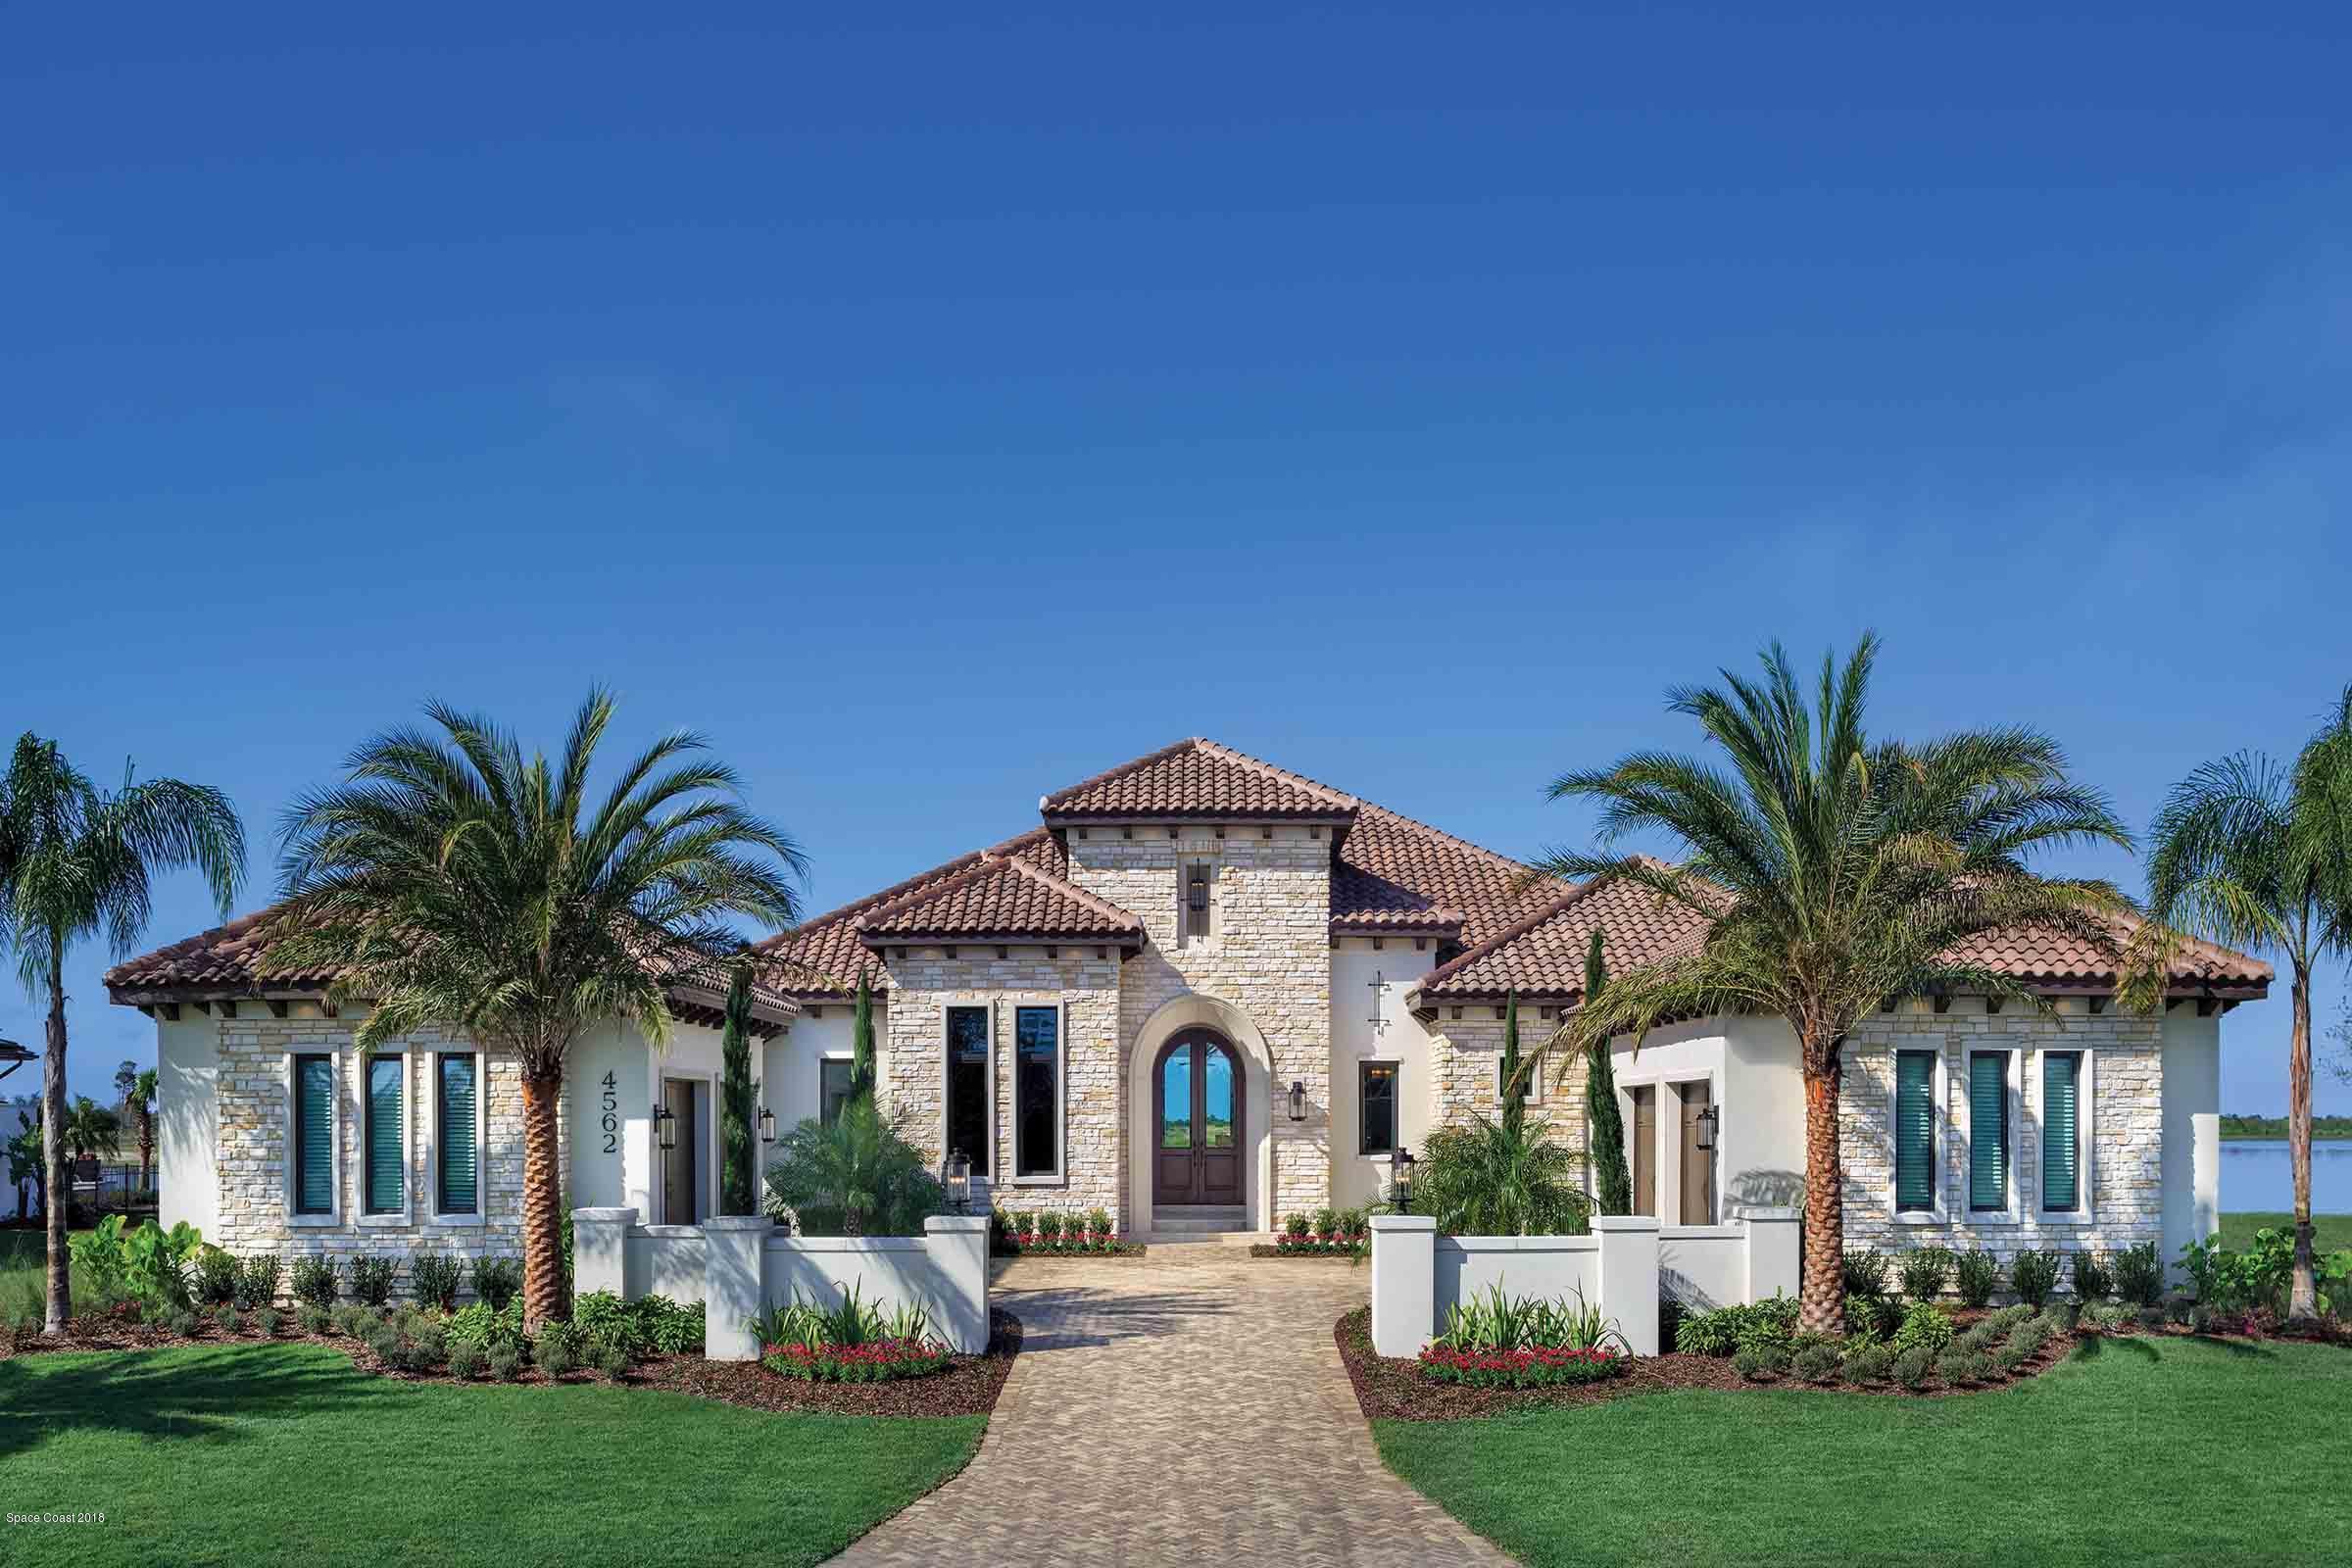 Single Family Home for Sale at 4562 Tennyson 4562 Tennyson Rockledge, Florida 32955 United States